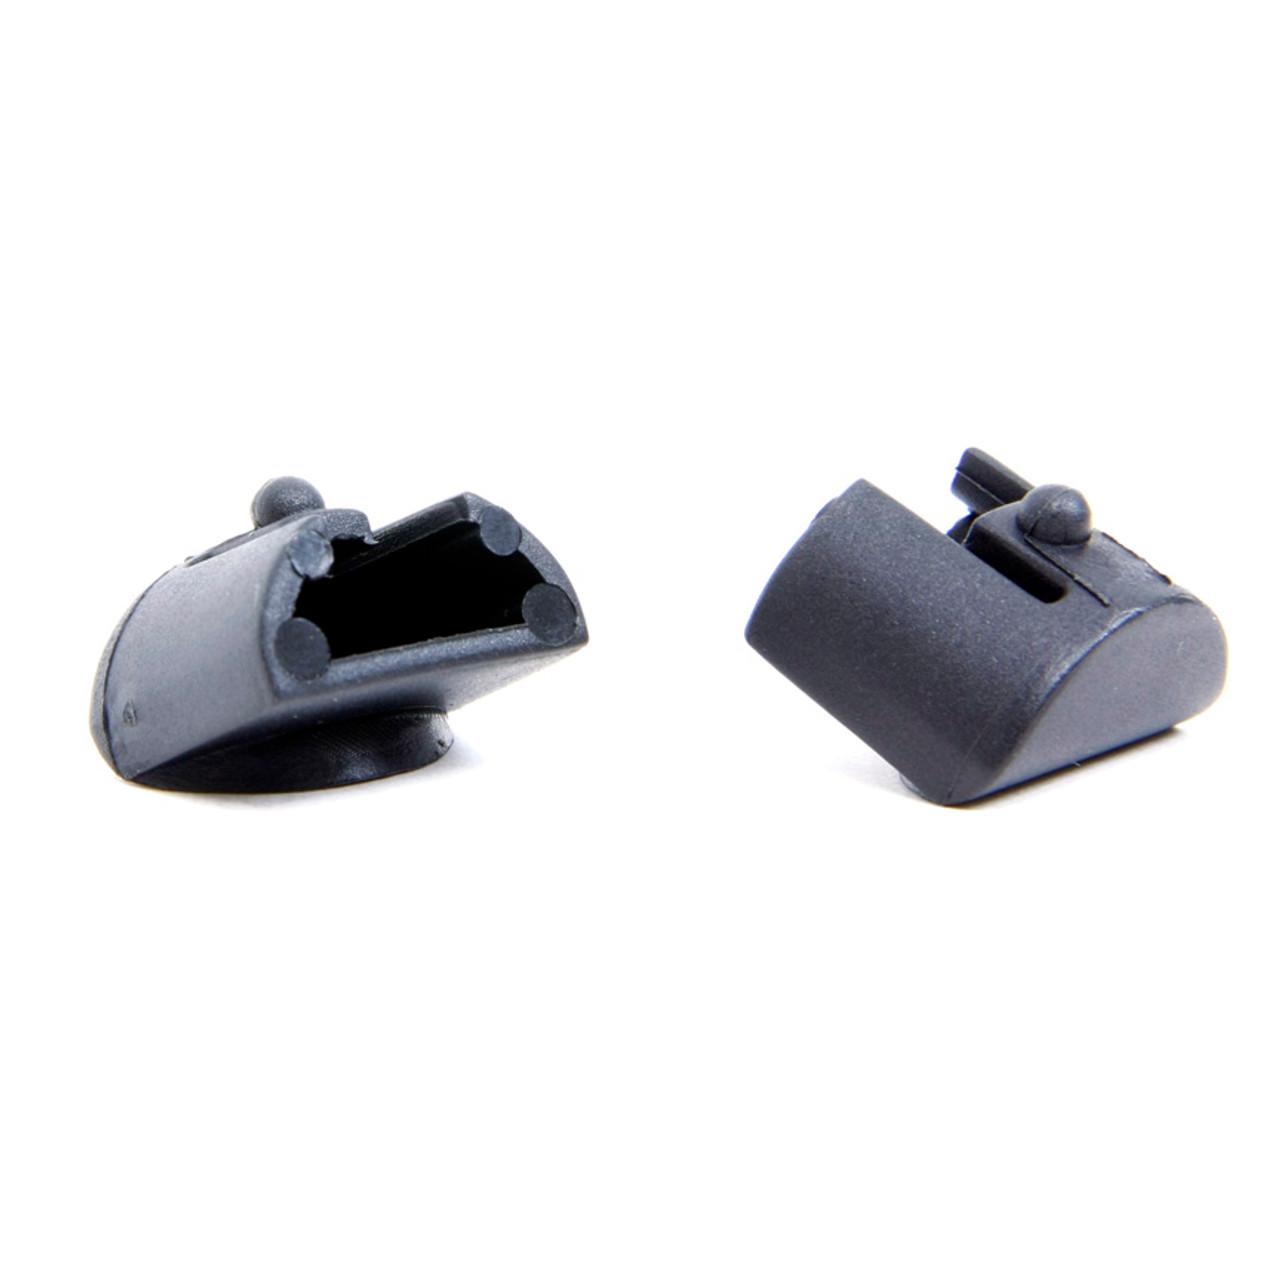 Fits the Glock® 17, 19, 22, 23 Grip Plug (2 Pack) - Black Polymer